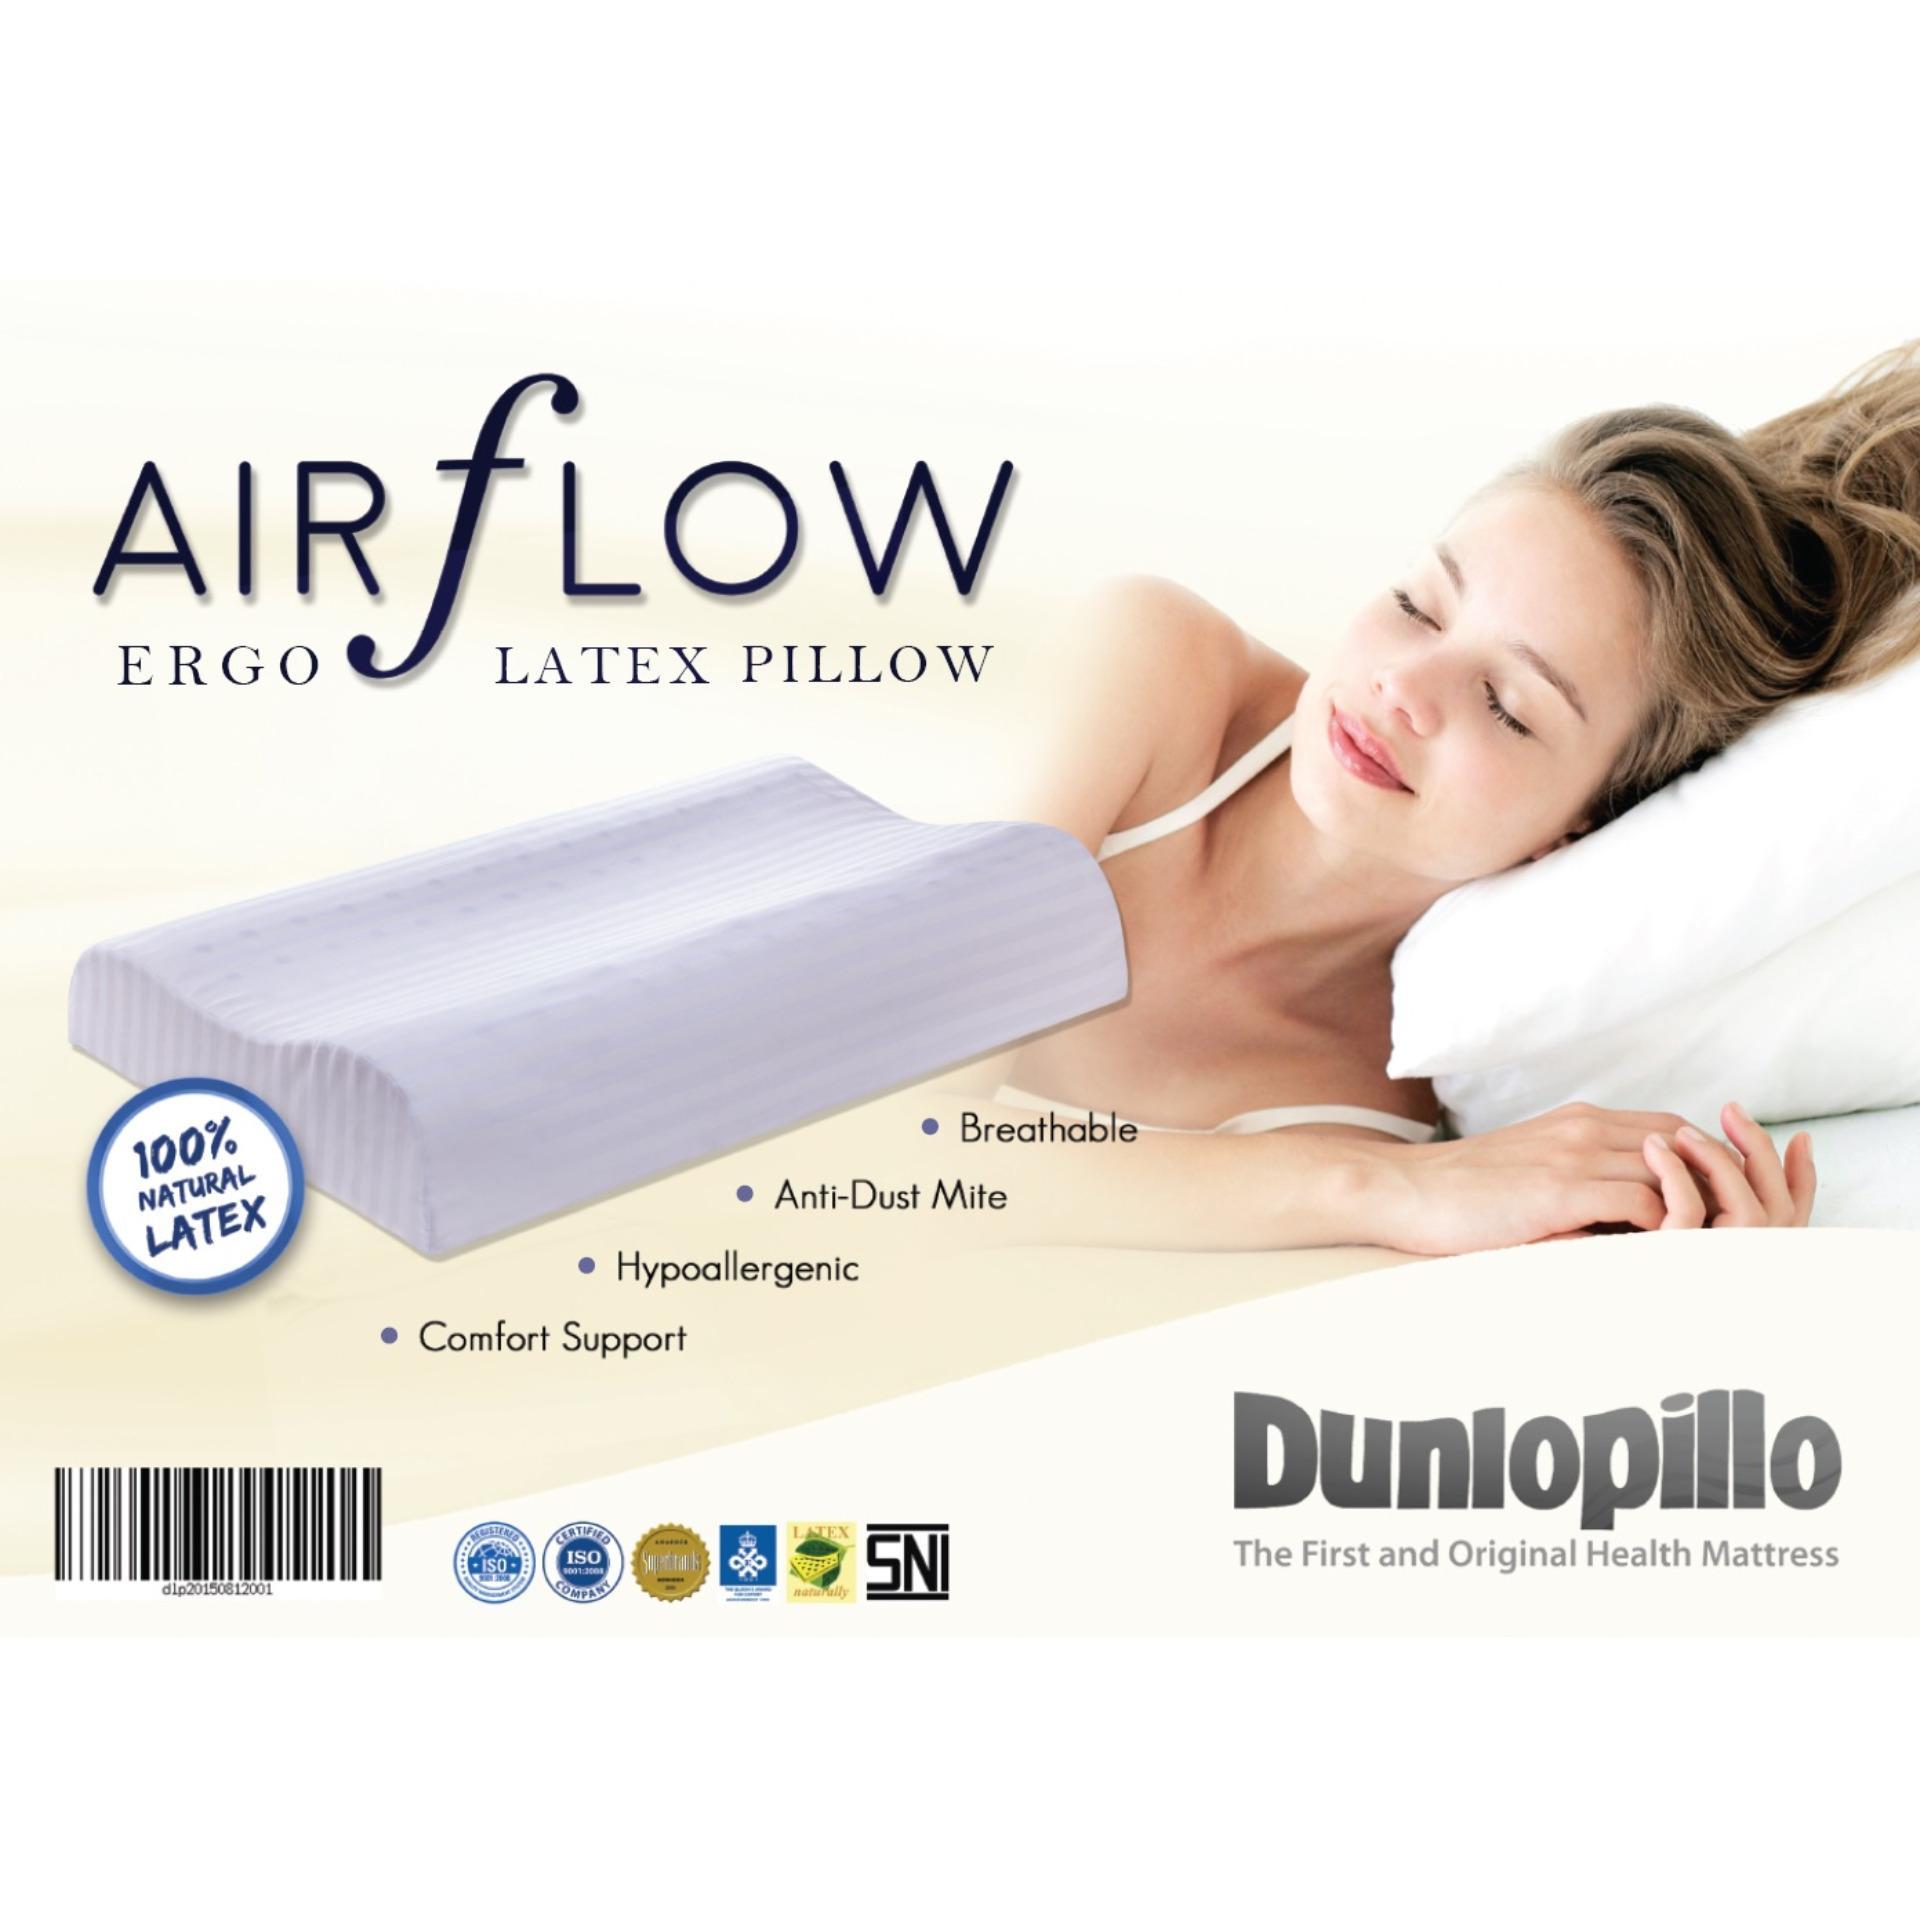 Price Dunlopillo 100 Natural Latex Ergo Pillow Dunlopillo Original